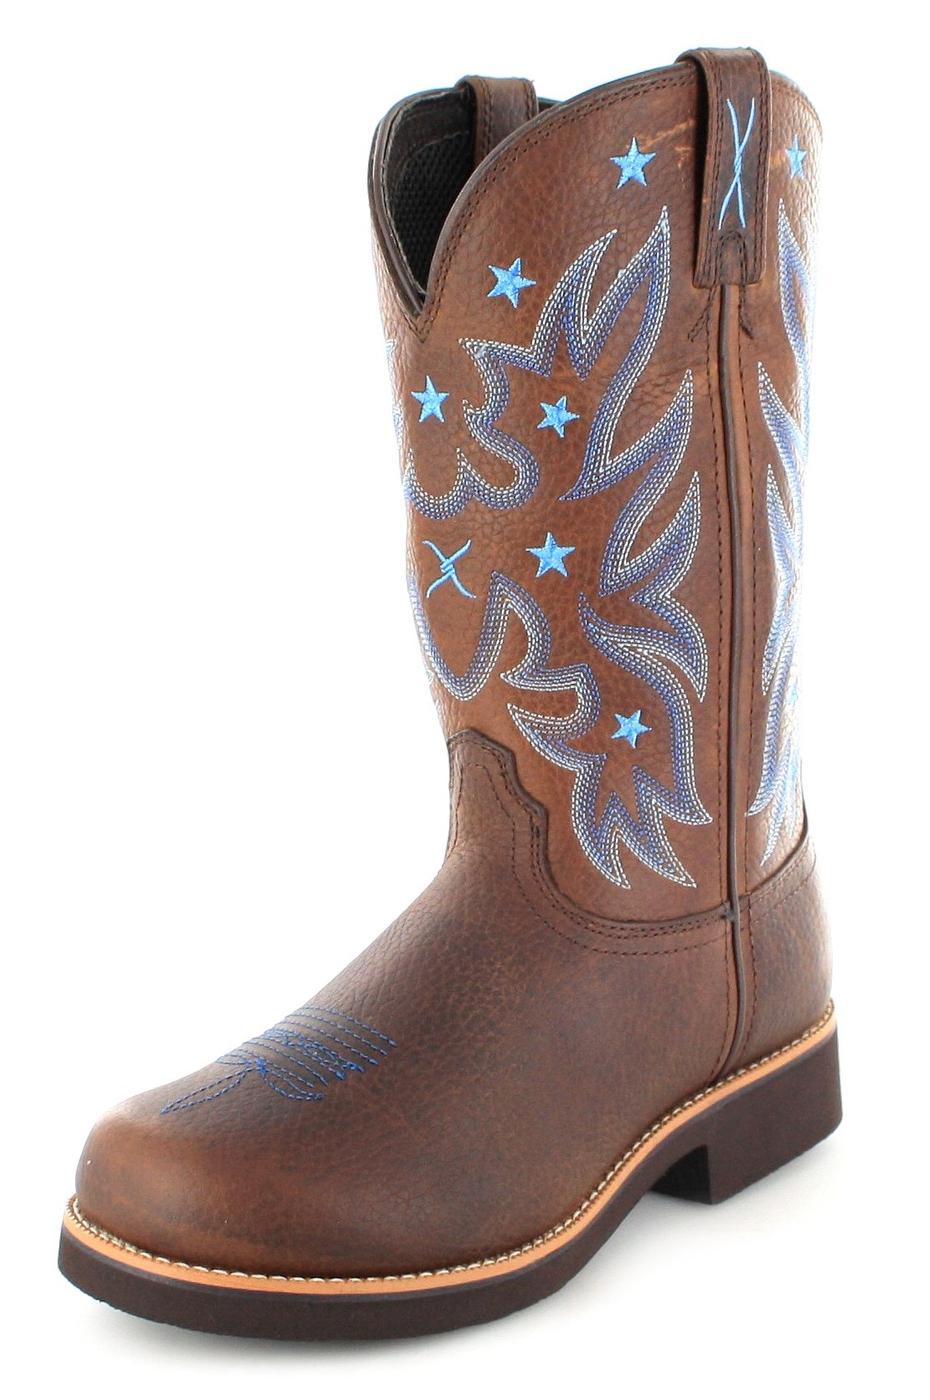 Twisted X Boots 1701 BARN BURNER Brown Pebble Damen Westernreitstiefel - dunkelbraun